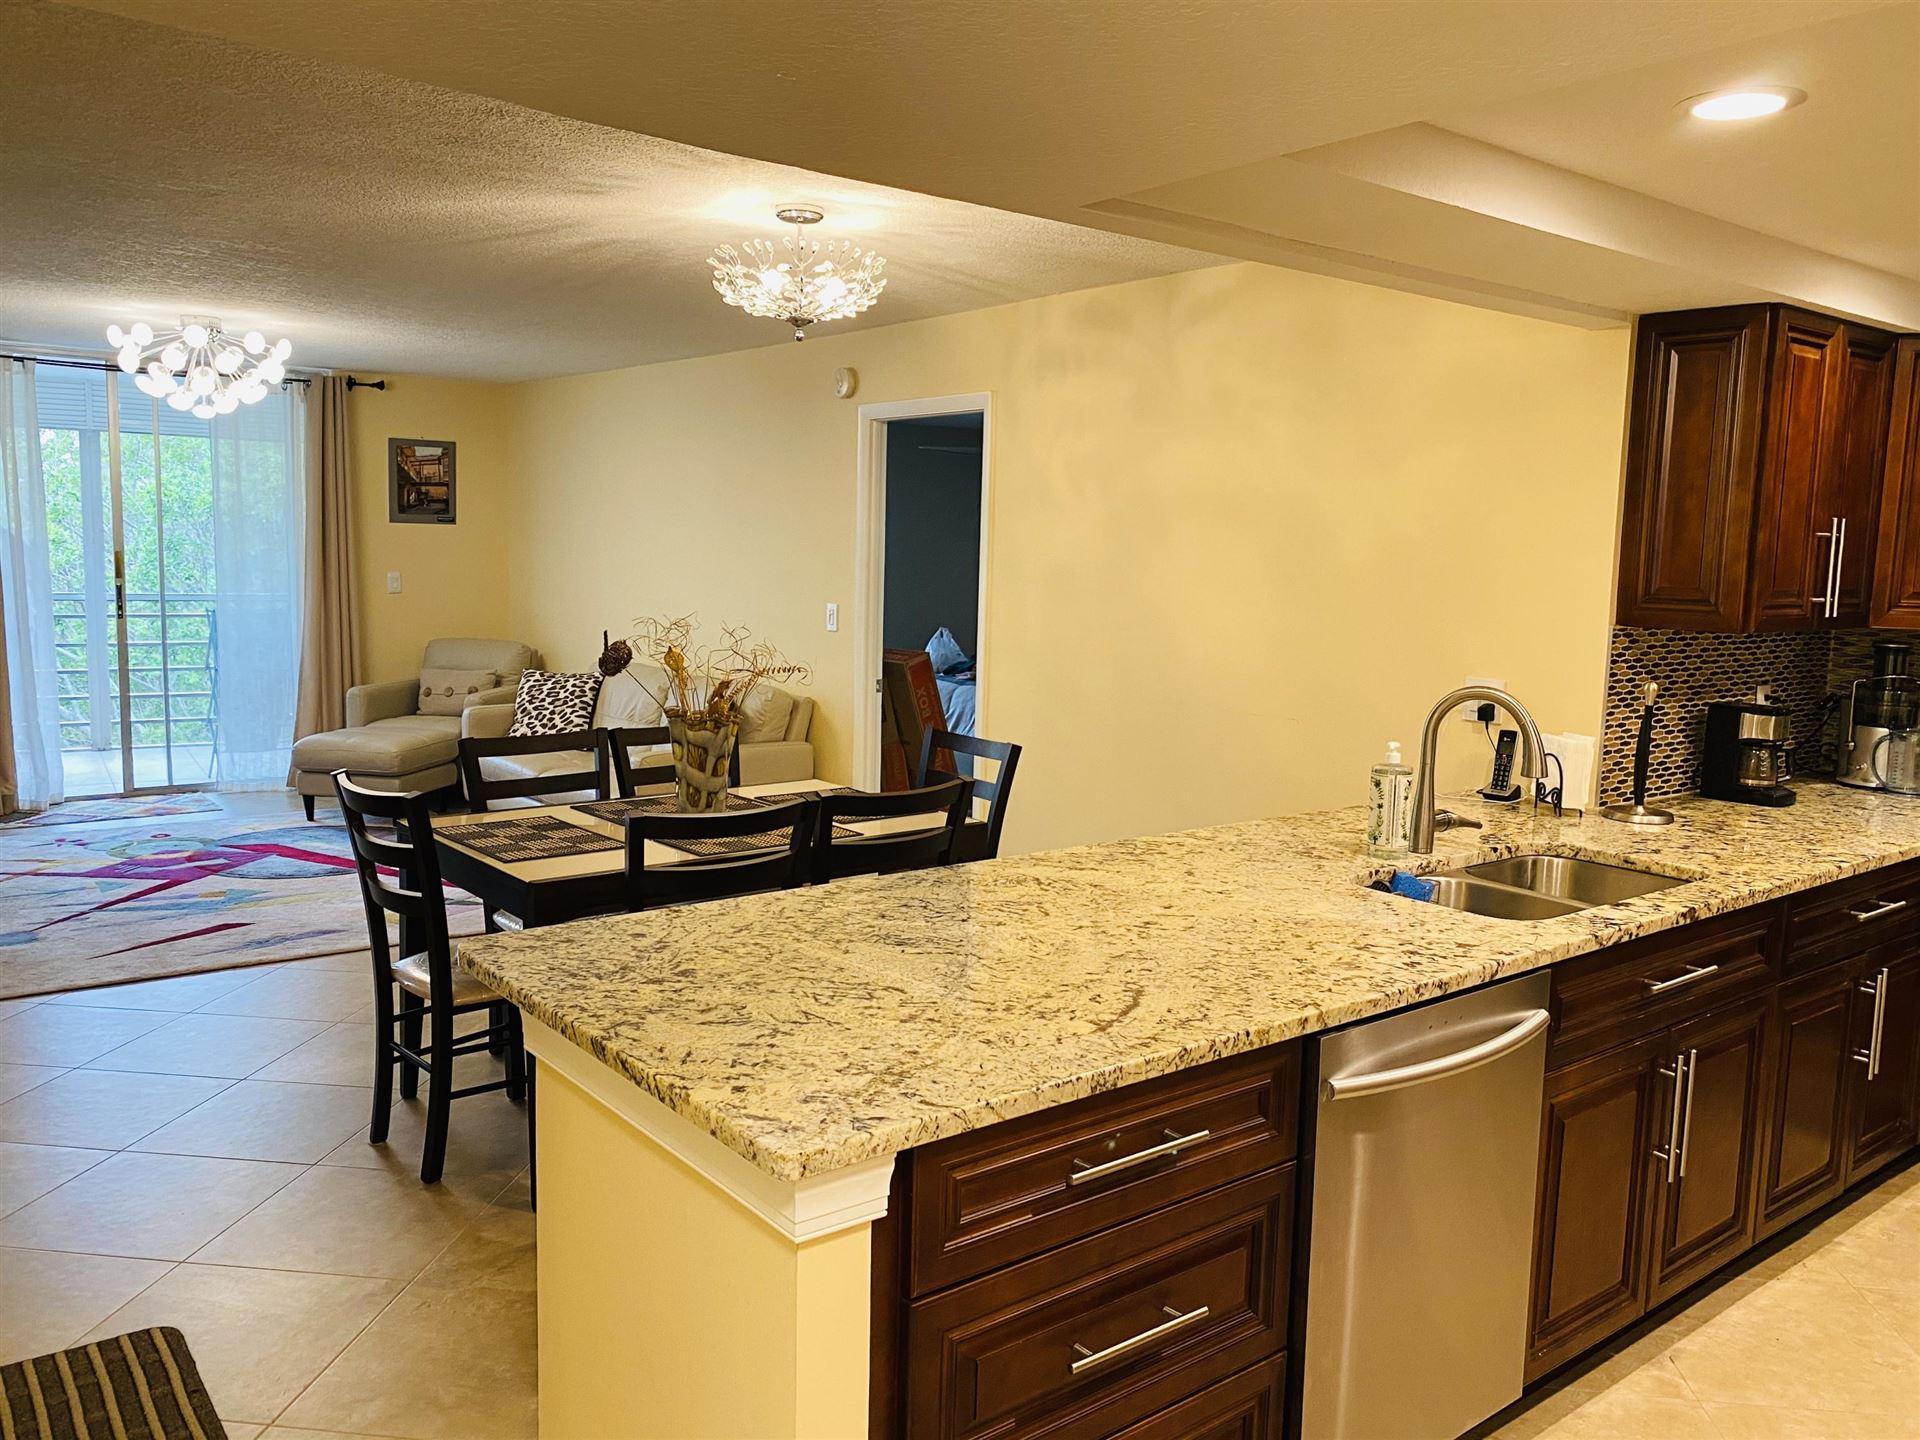 6461 NW 2nd Avenue #416, Boca Raton, FL 33487 - #: RX-10622658